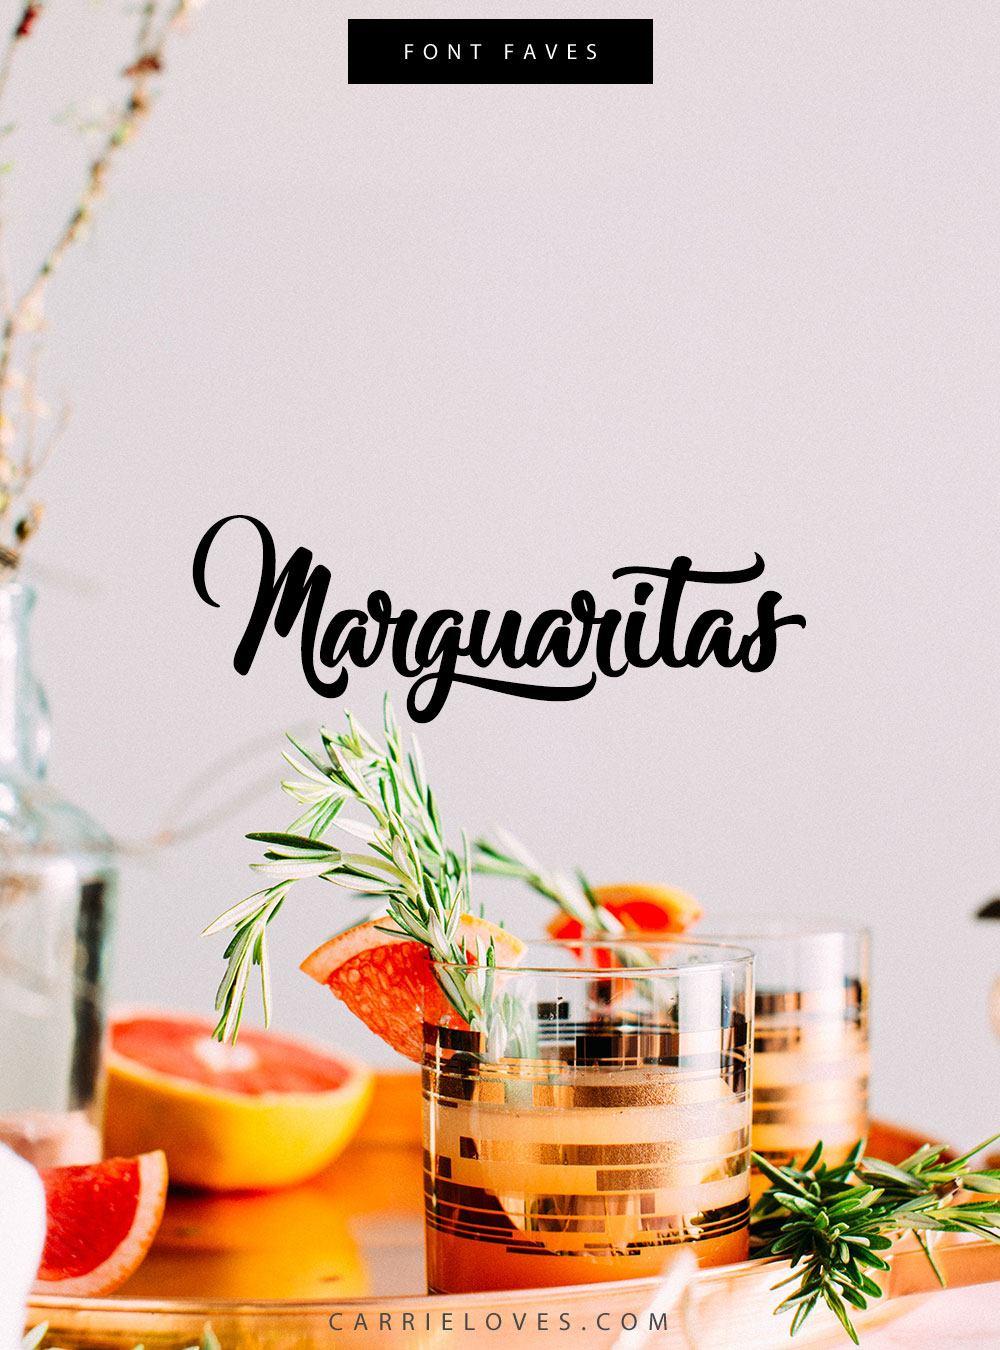 Font Faves Marguaritas - Carrie Loves Blog